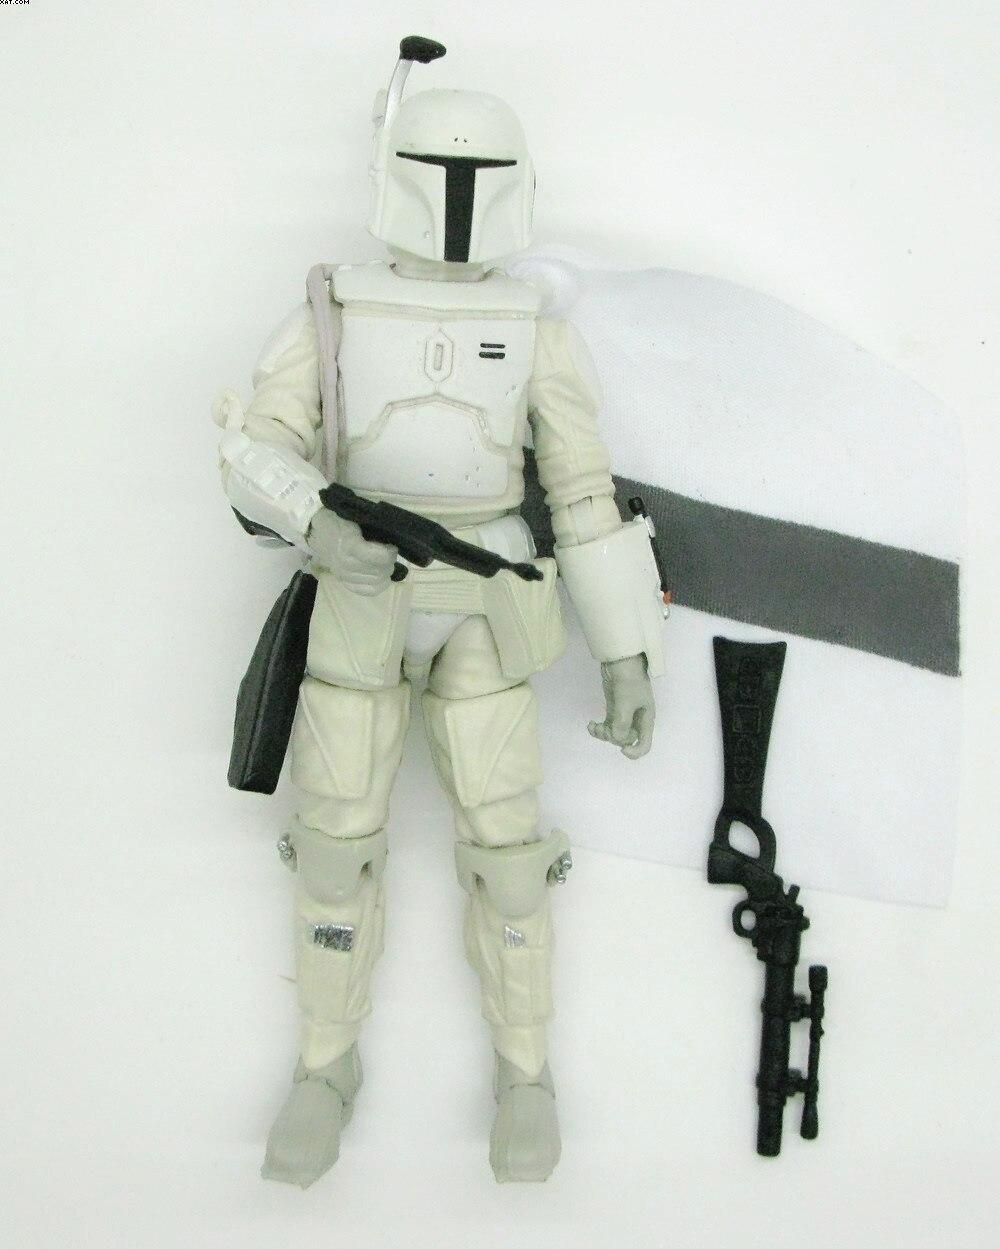 Star Wars Black Series 6 Action Figure boba fett A60C<br><br>Aliexpress